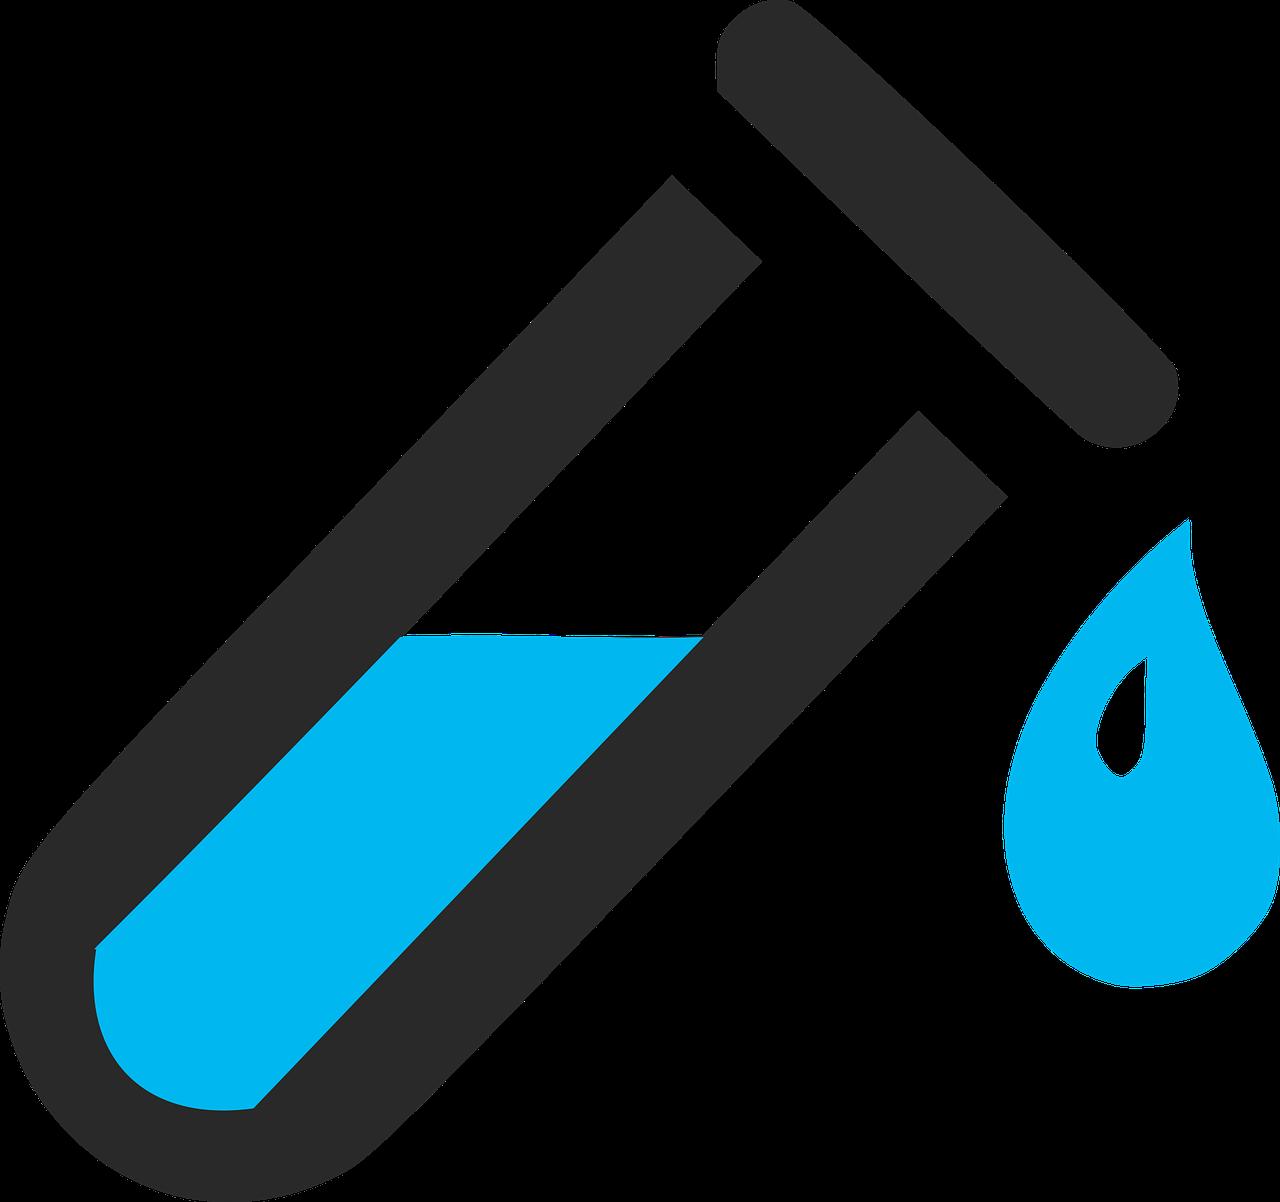 Vandkvalitet